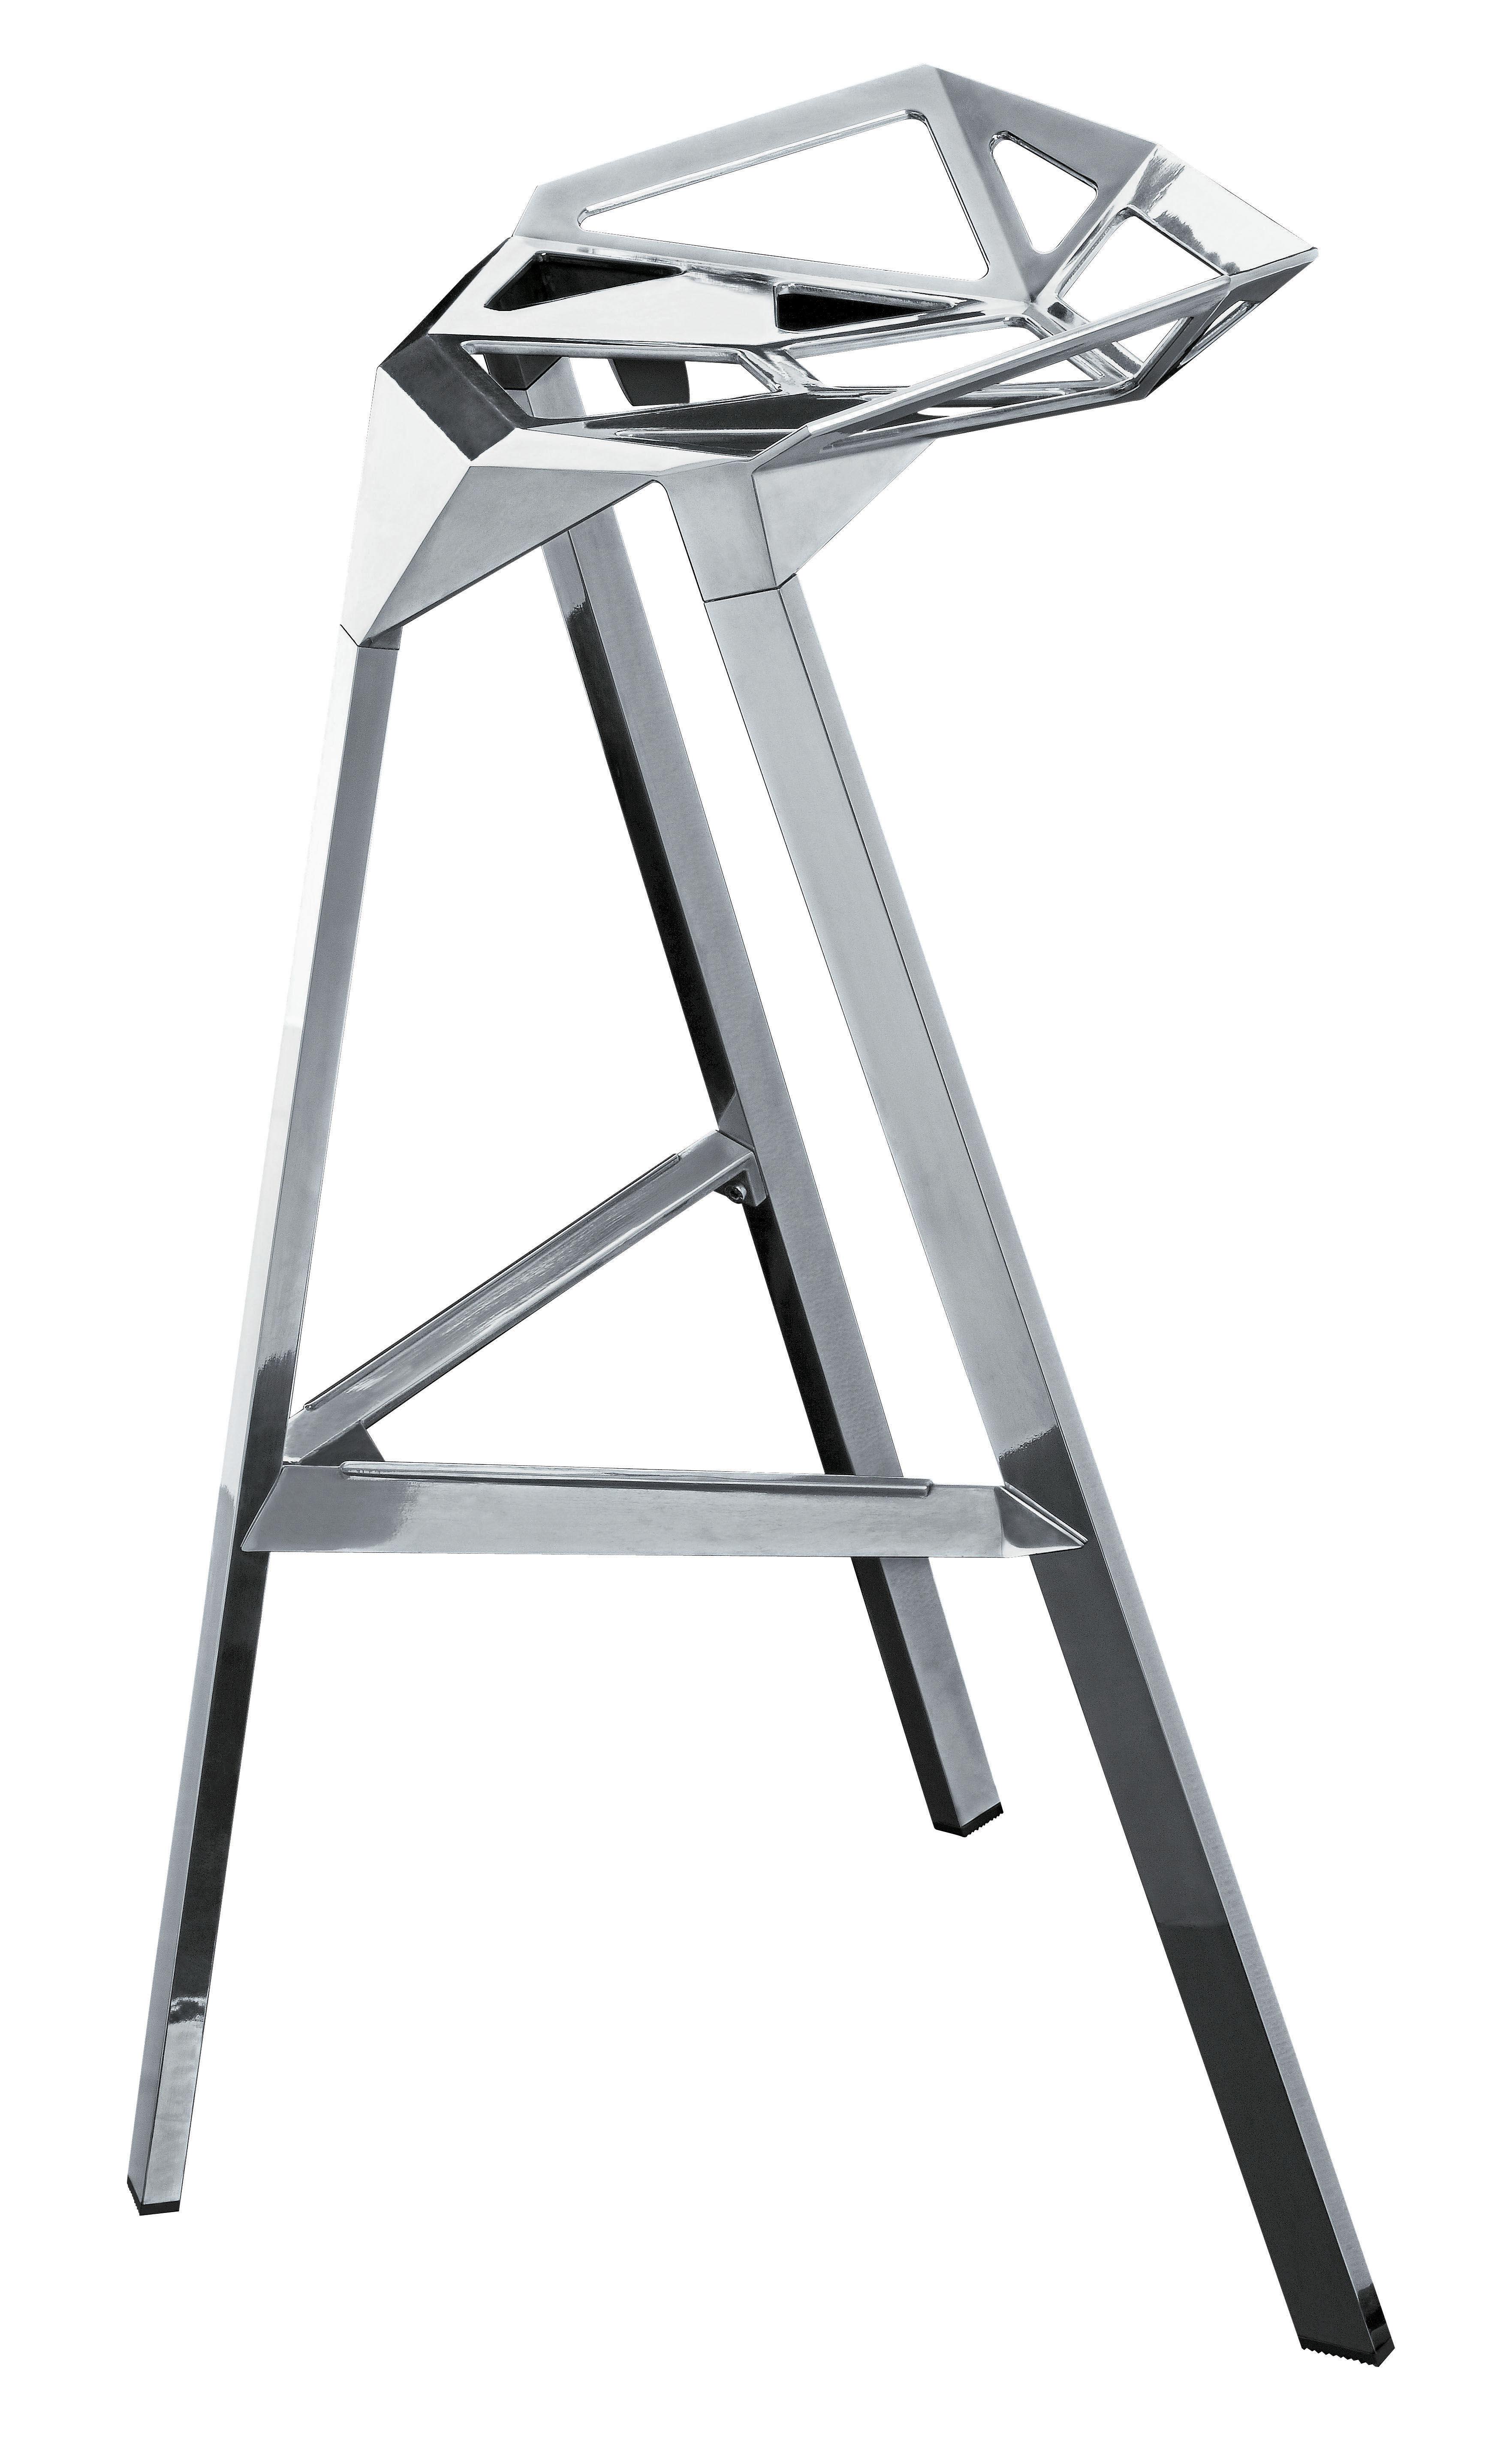 tabouret de bar stool one h 67 cm version alu poli alu poli magis. Black Bedroom Furniture Sets. Home Design Ideas